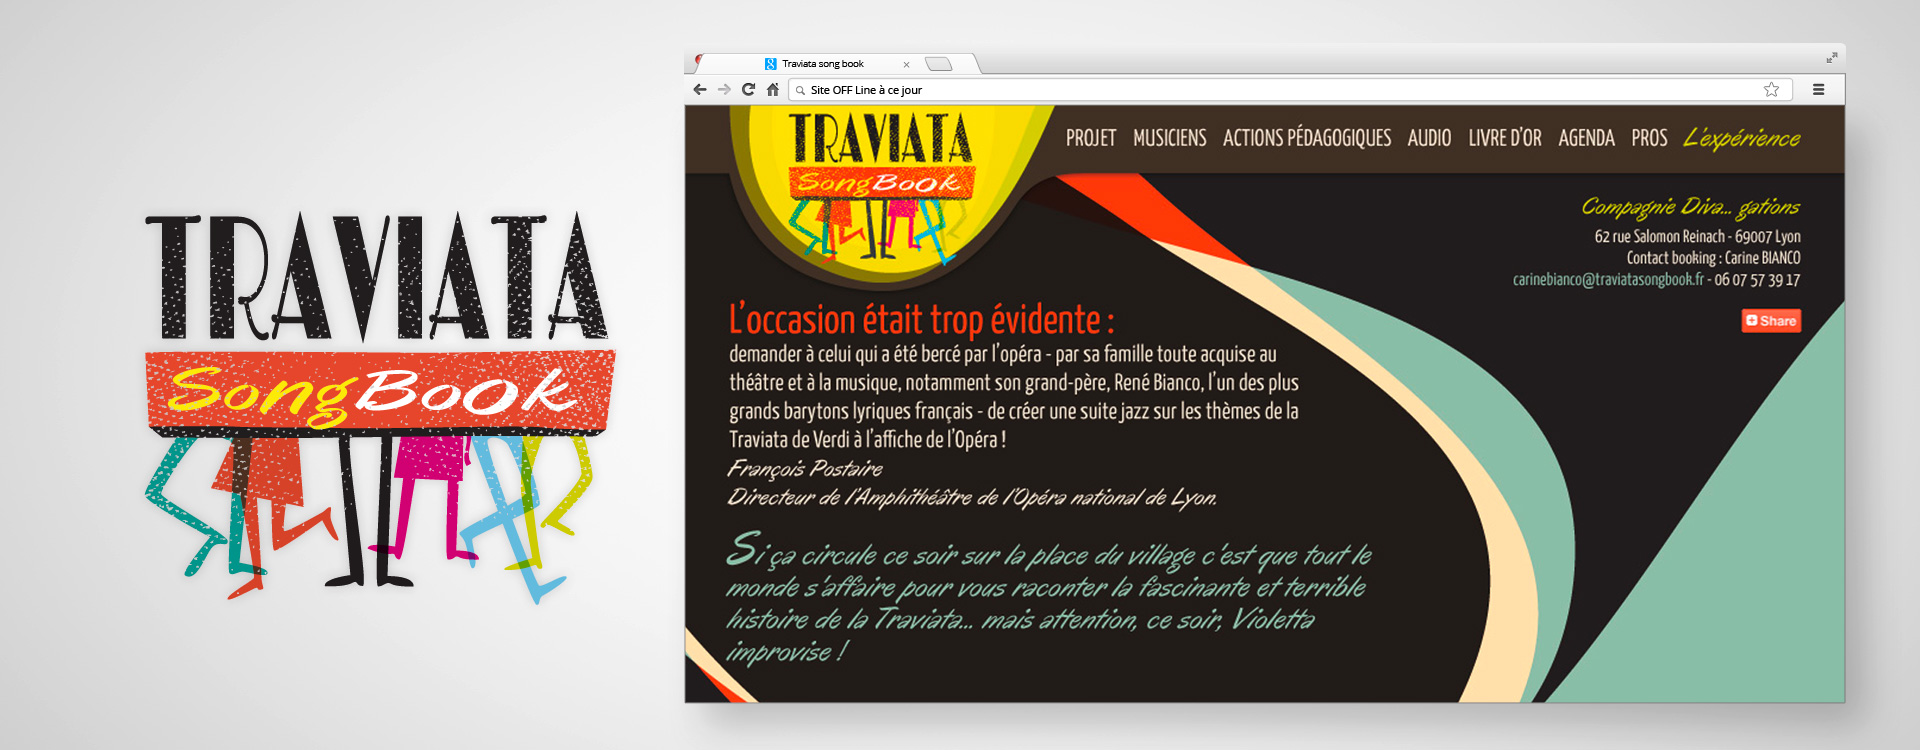 traviata-1